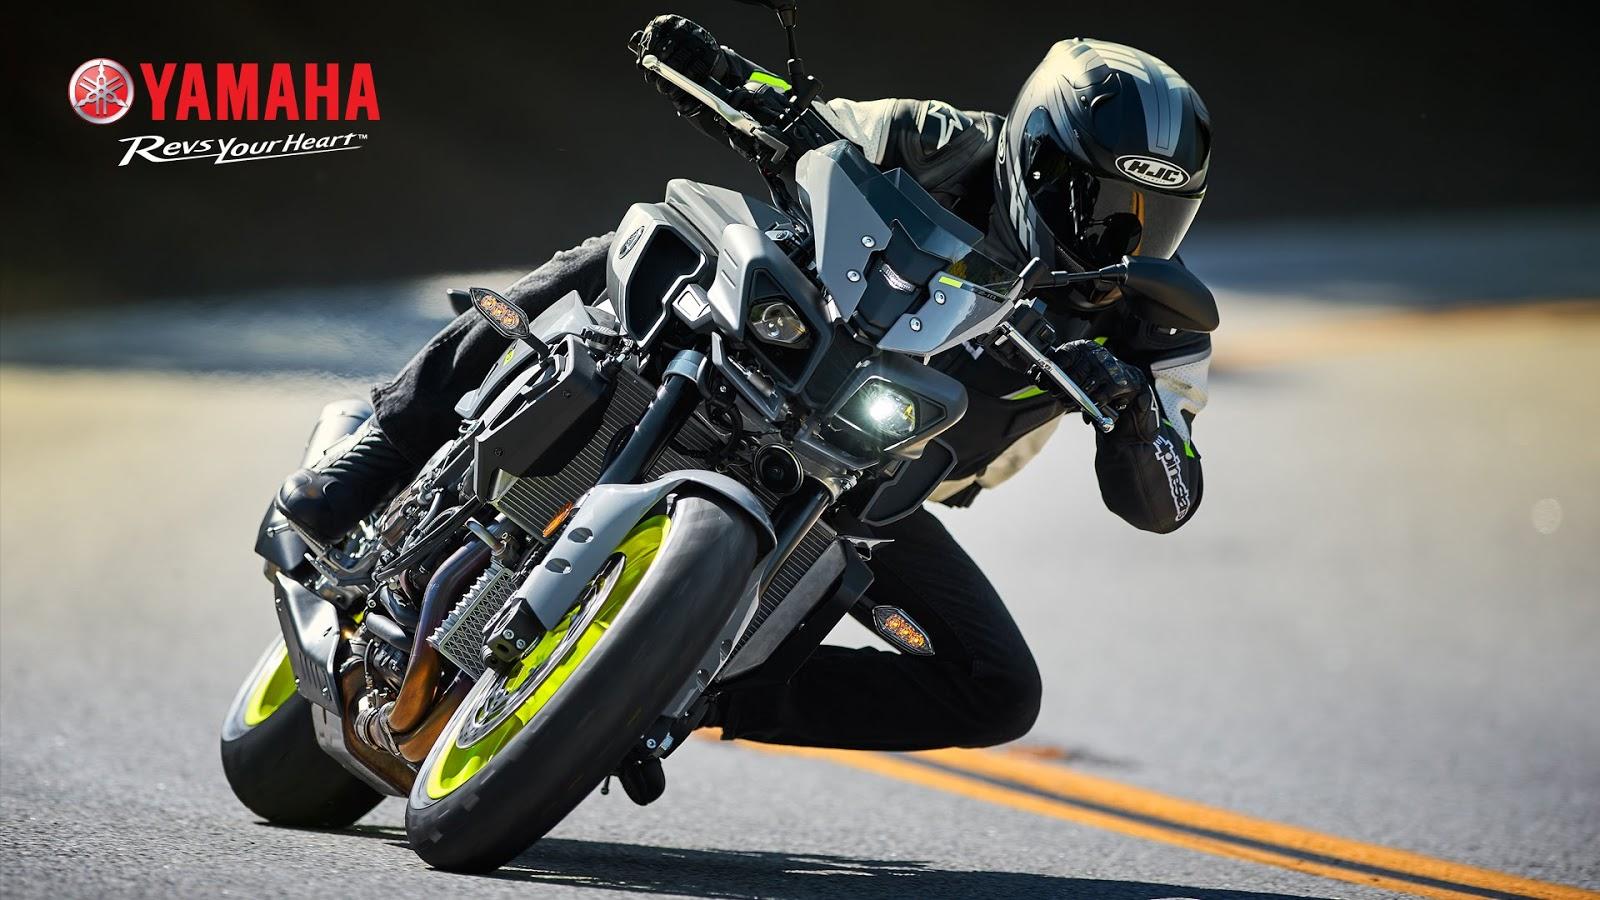 Wallpaper Yamaha Fz 10 Sportbikes 2017 Bikes Yamaha Hd: 2017 Yamaha FZ-10 Hd Wallpapers